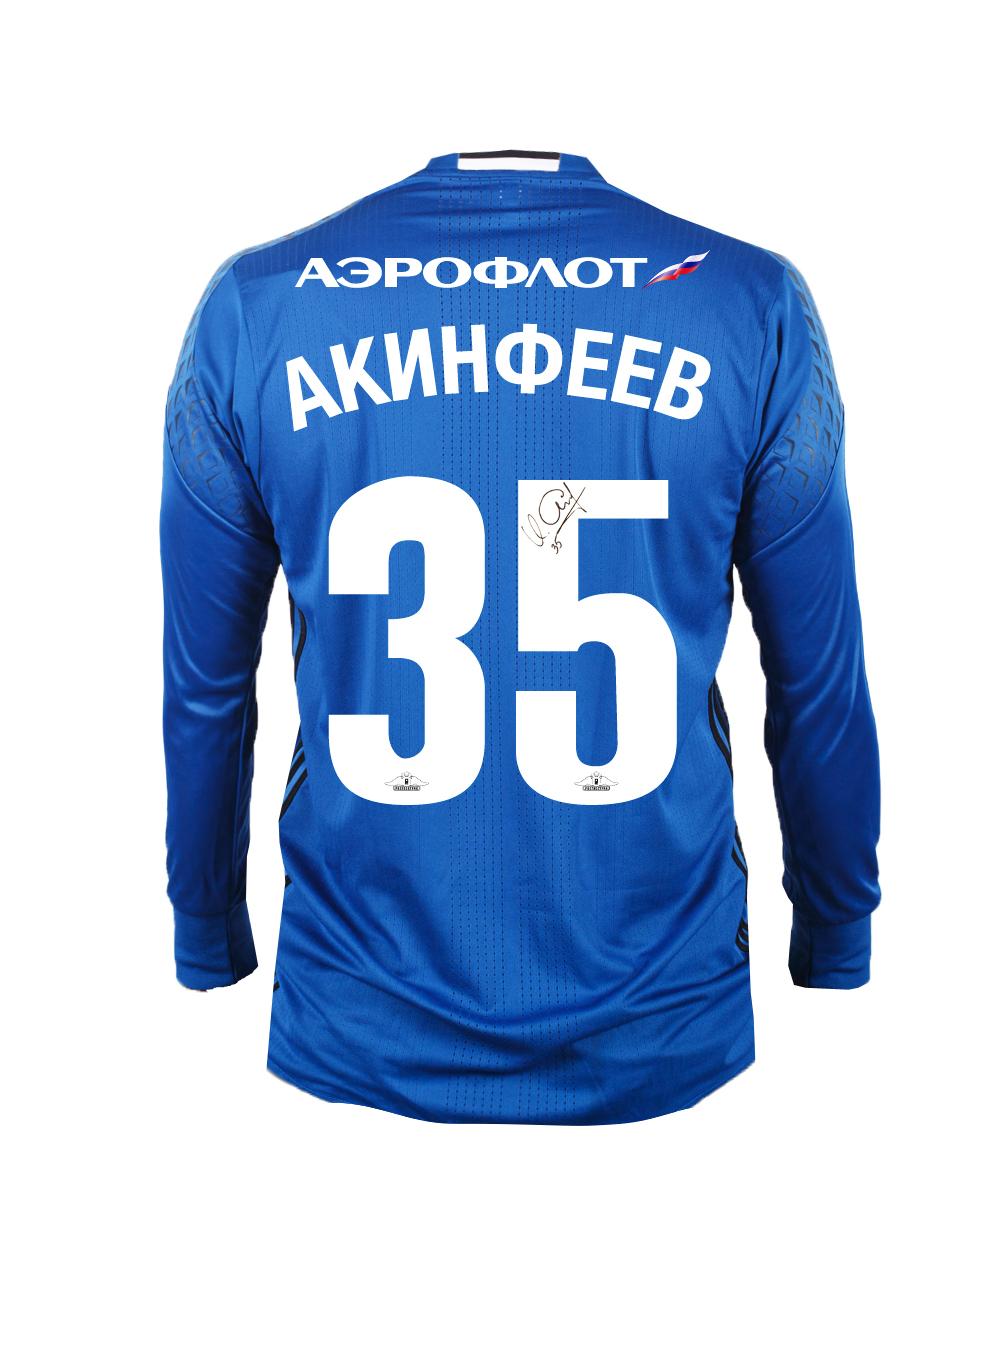 Вратарский свитер д/р, цвет синий с автографом АКИНФЕЕВА (8) фото